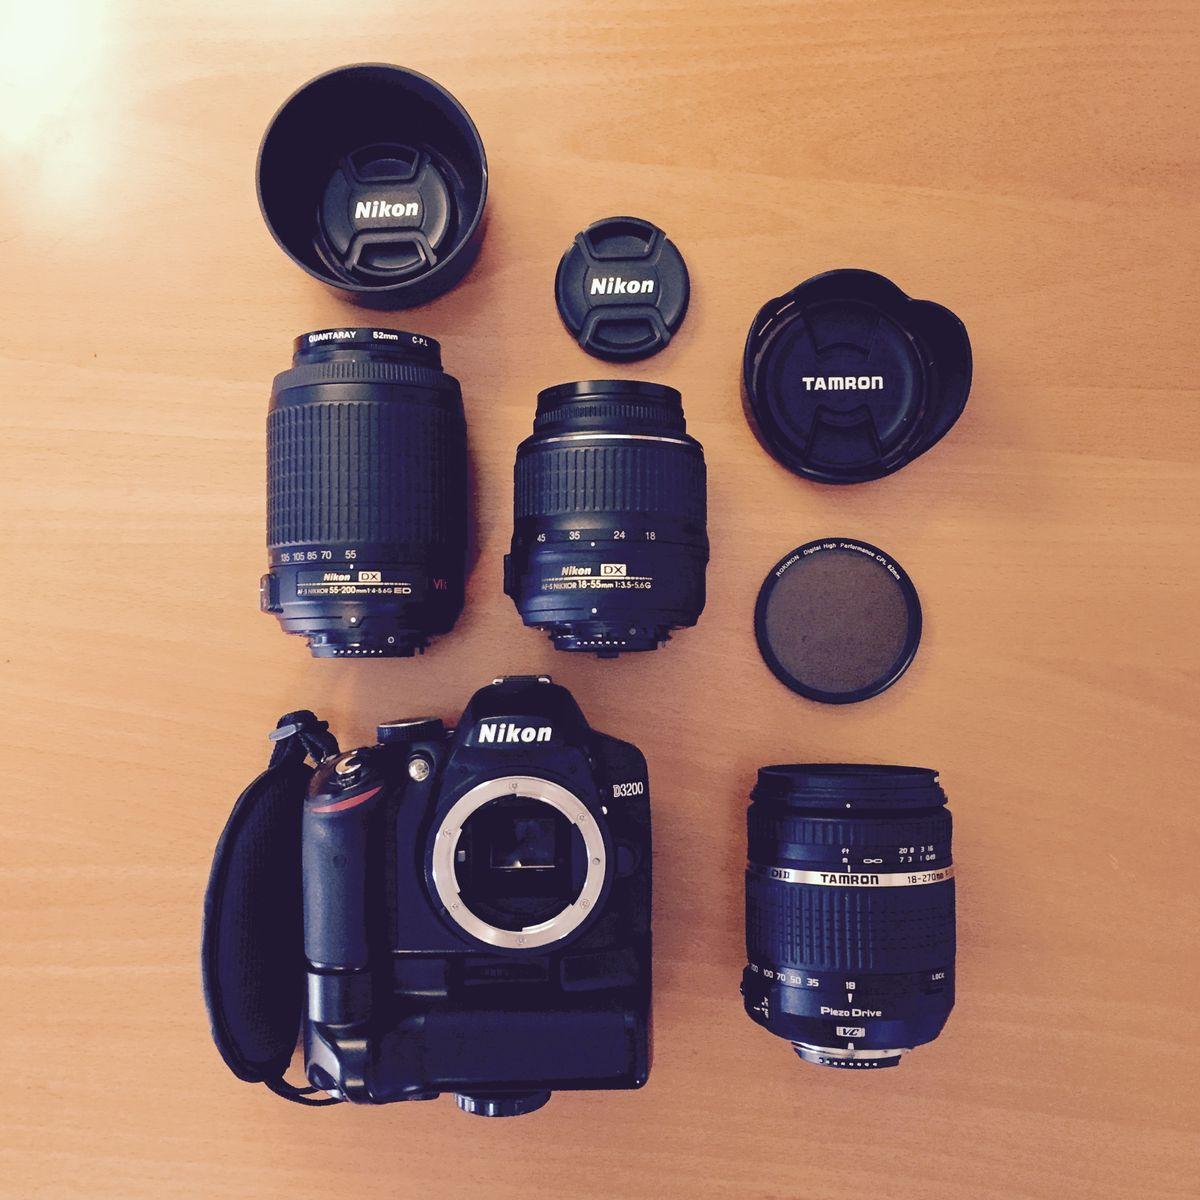 Nikon D3200.jpg